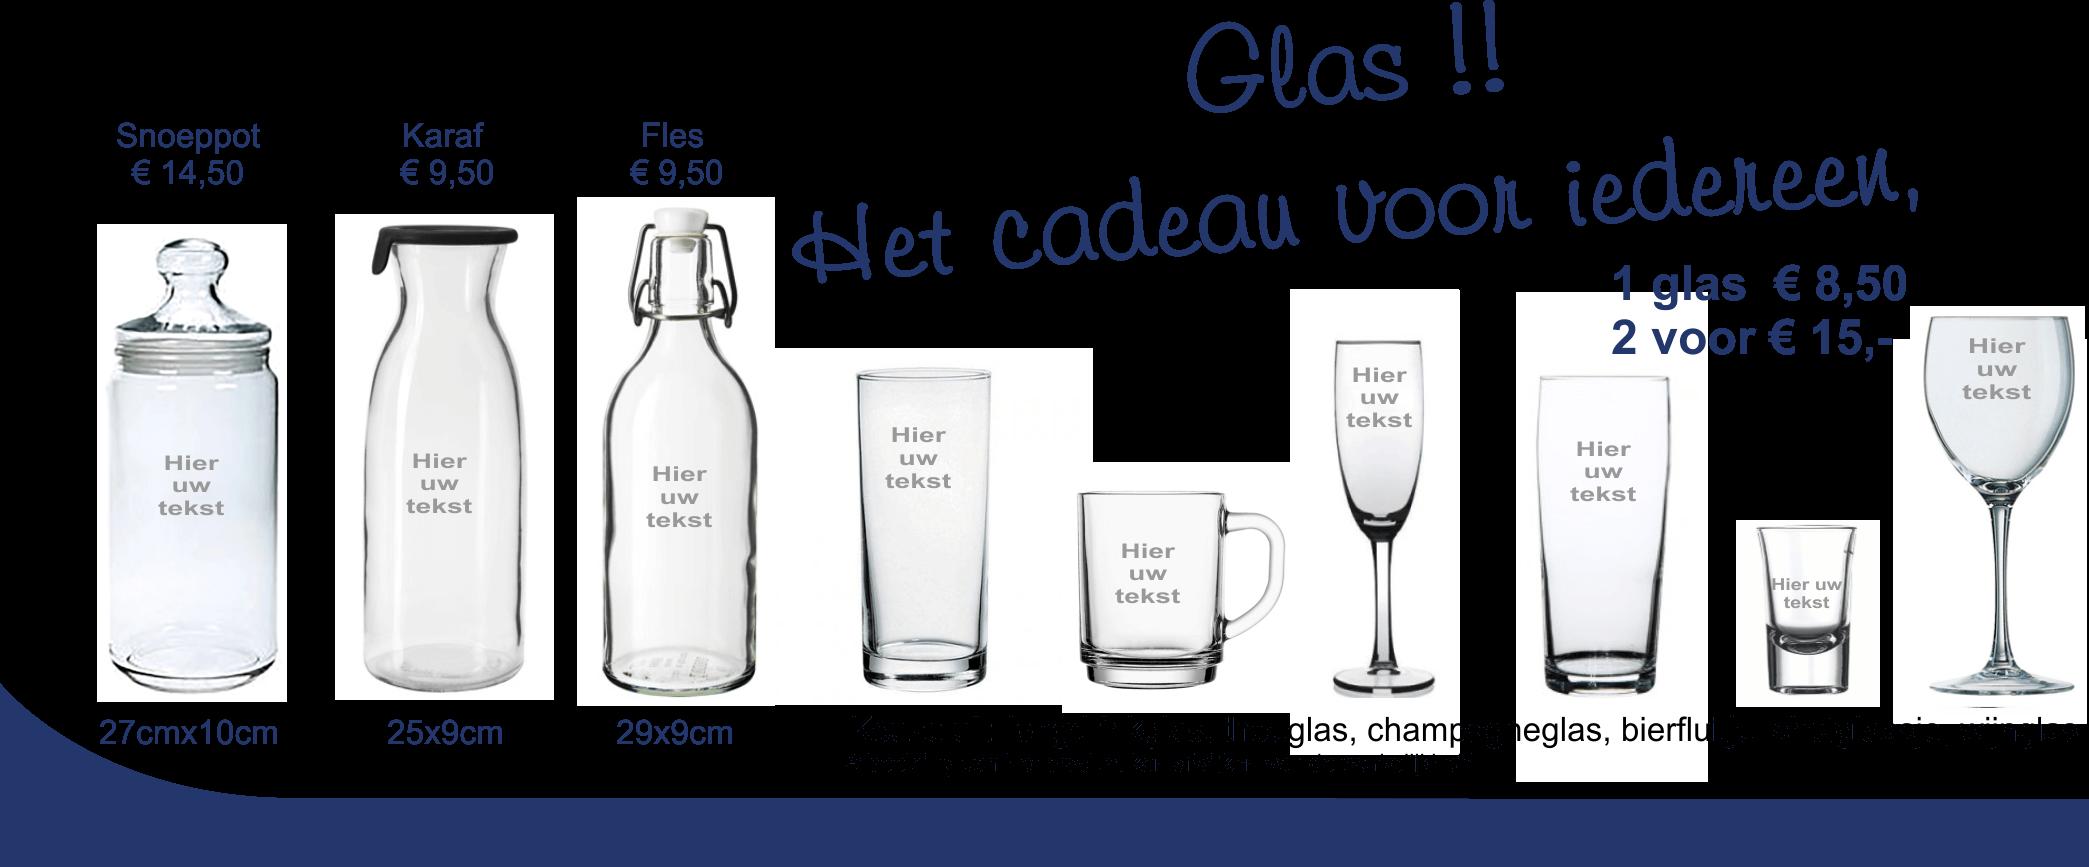 Glas bedrukken LowIe Kopie